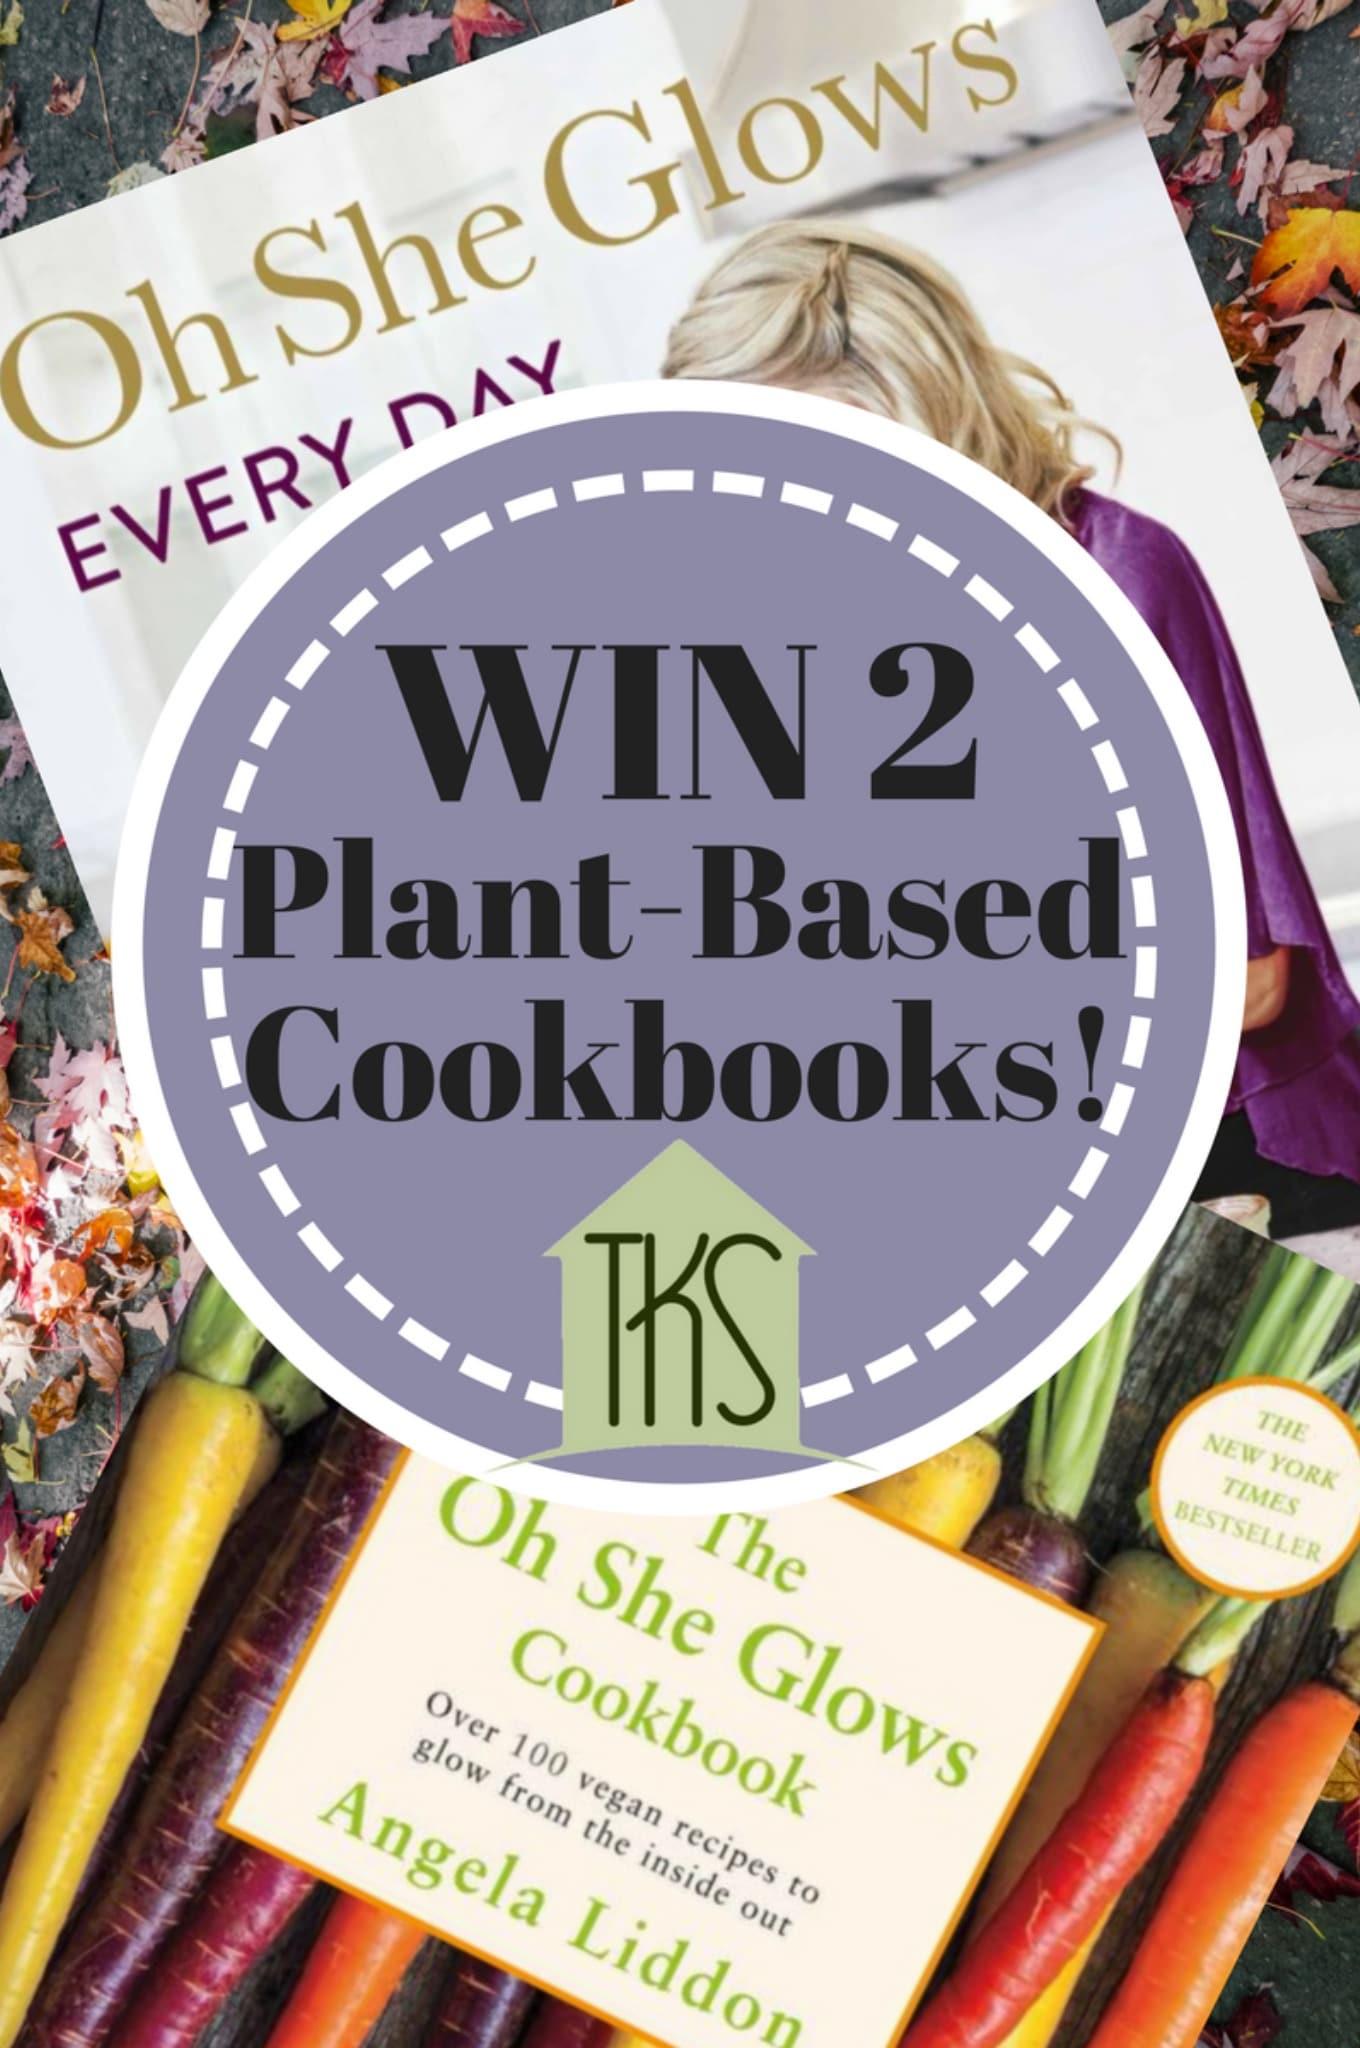 WIN 2 Plant Based Cookbooks - Oh She Glows